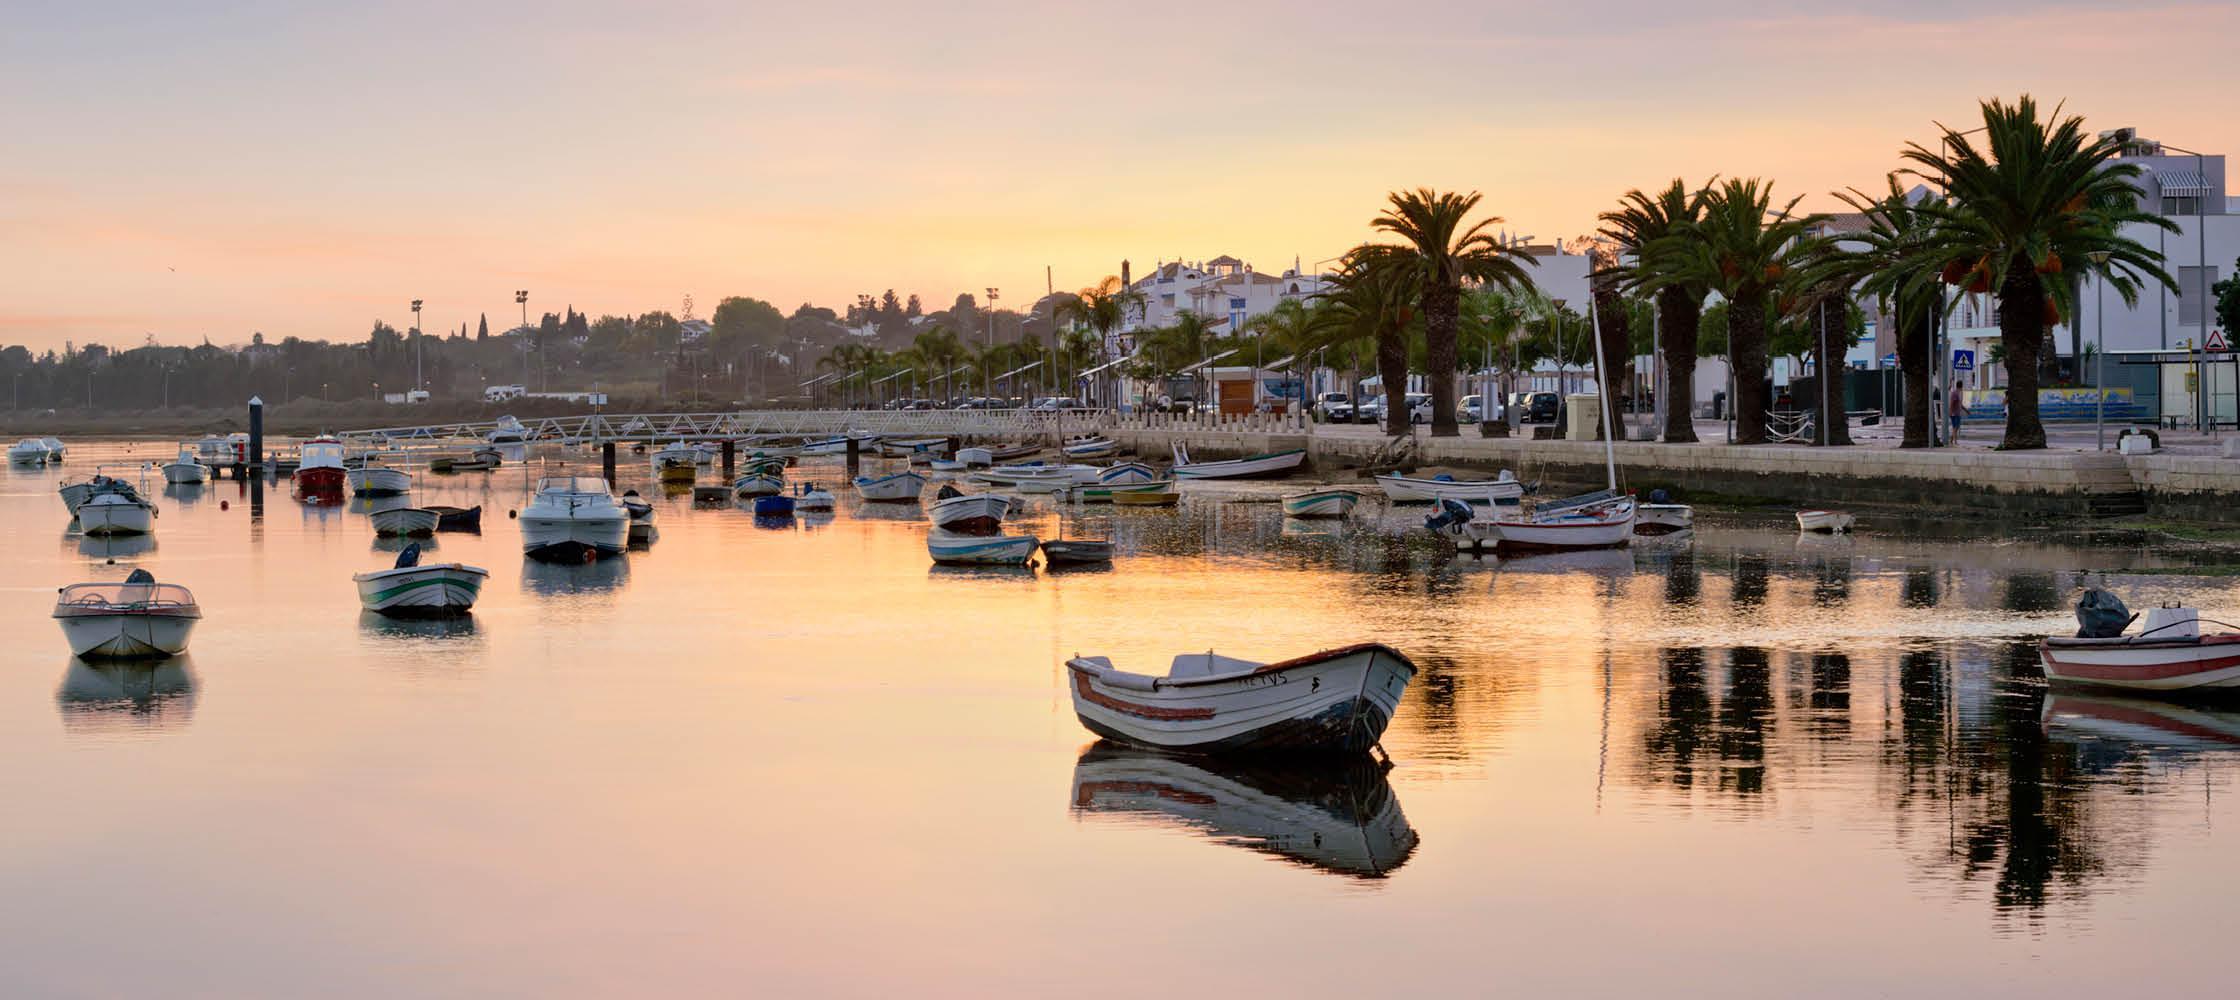 Idylliske Tavira i Algarve, Portugal